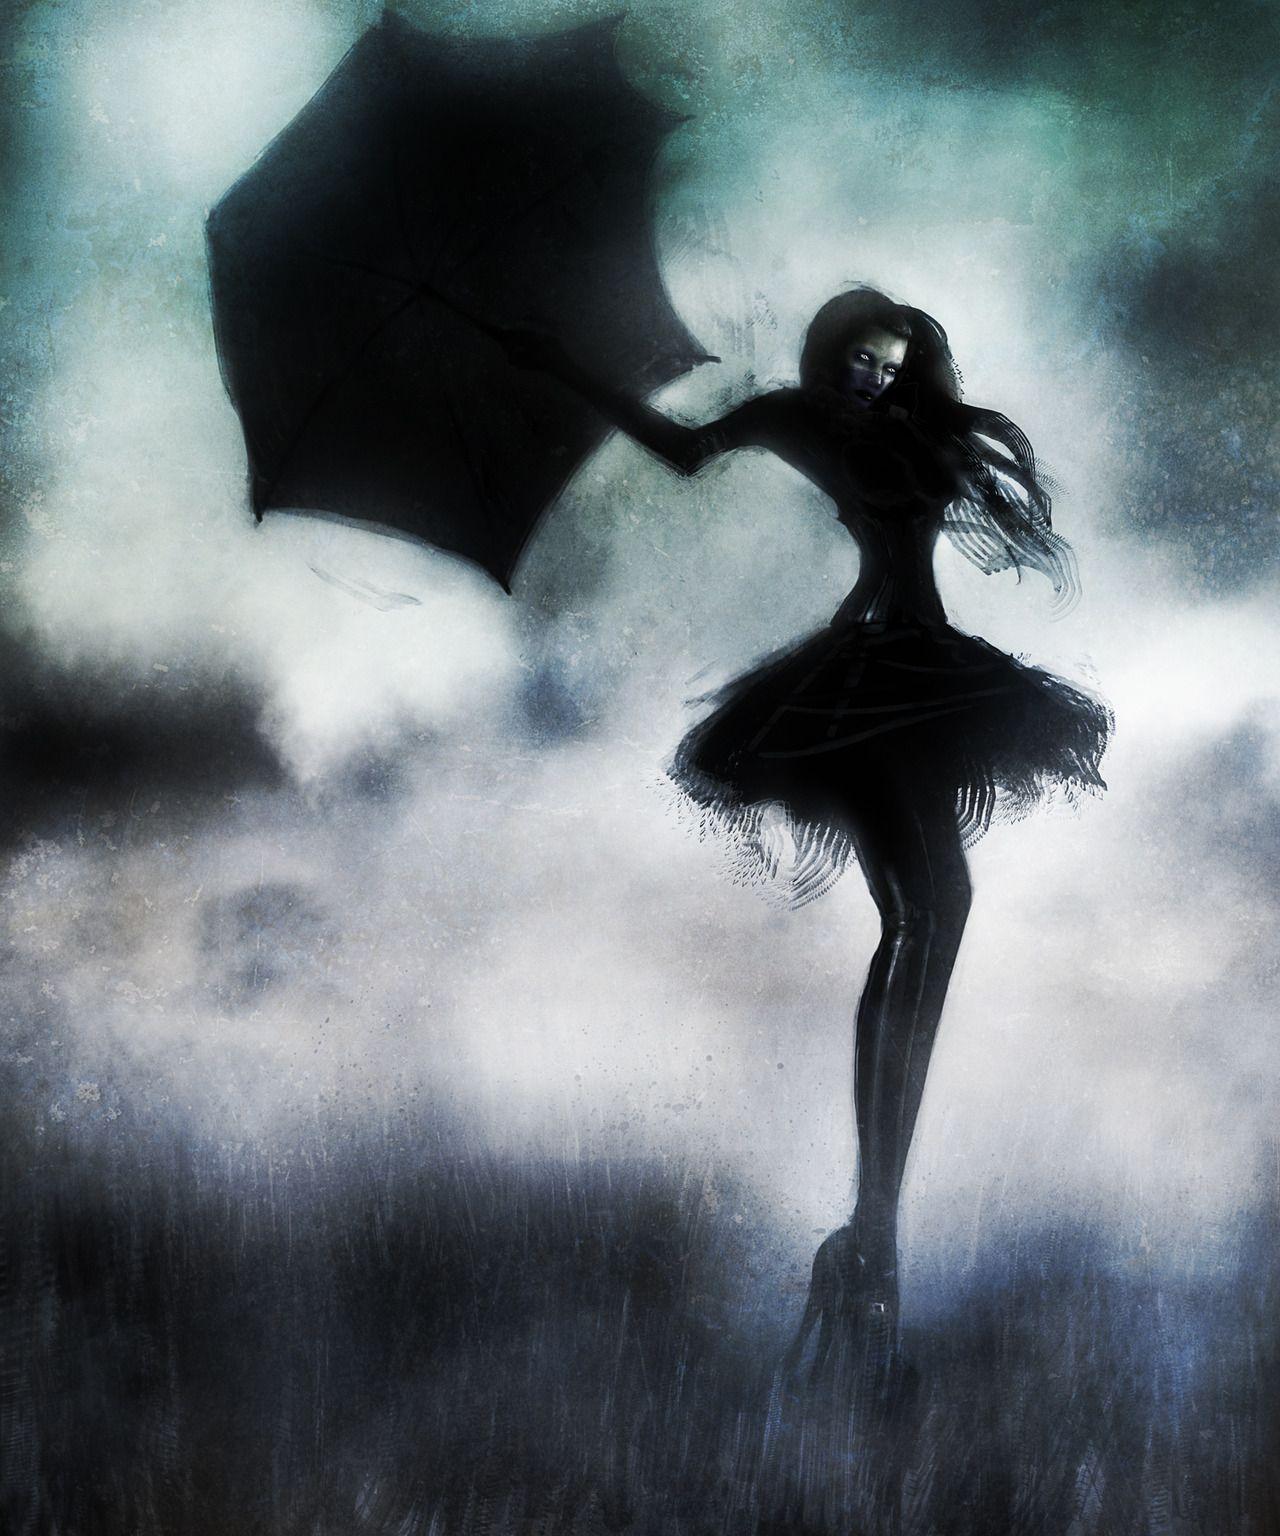 goth. digital. surreal. portrait. | Surreal art, Dark gothic art, Art